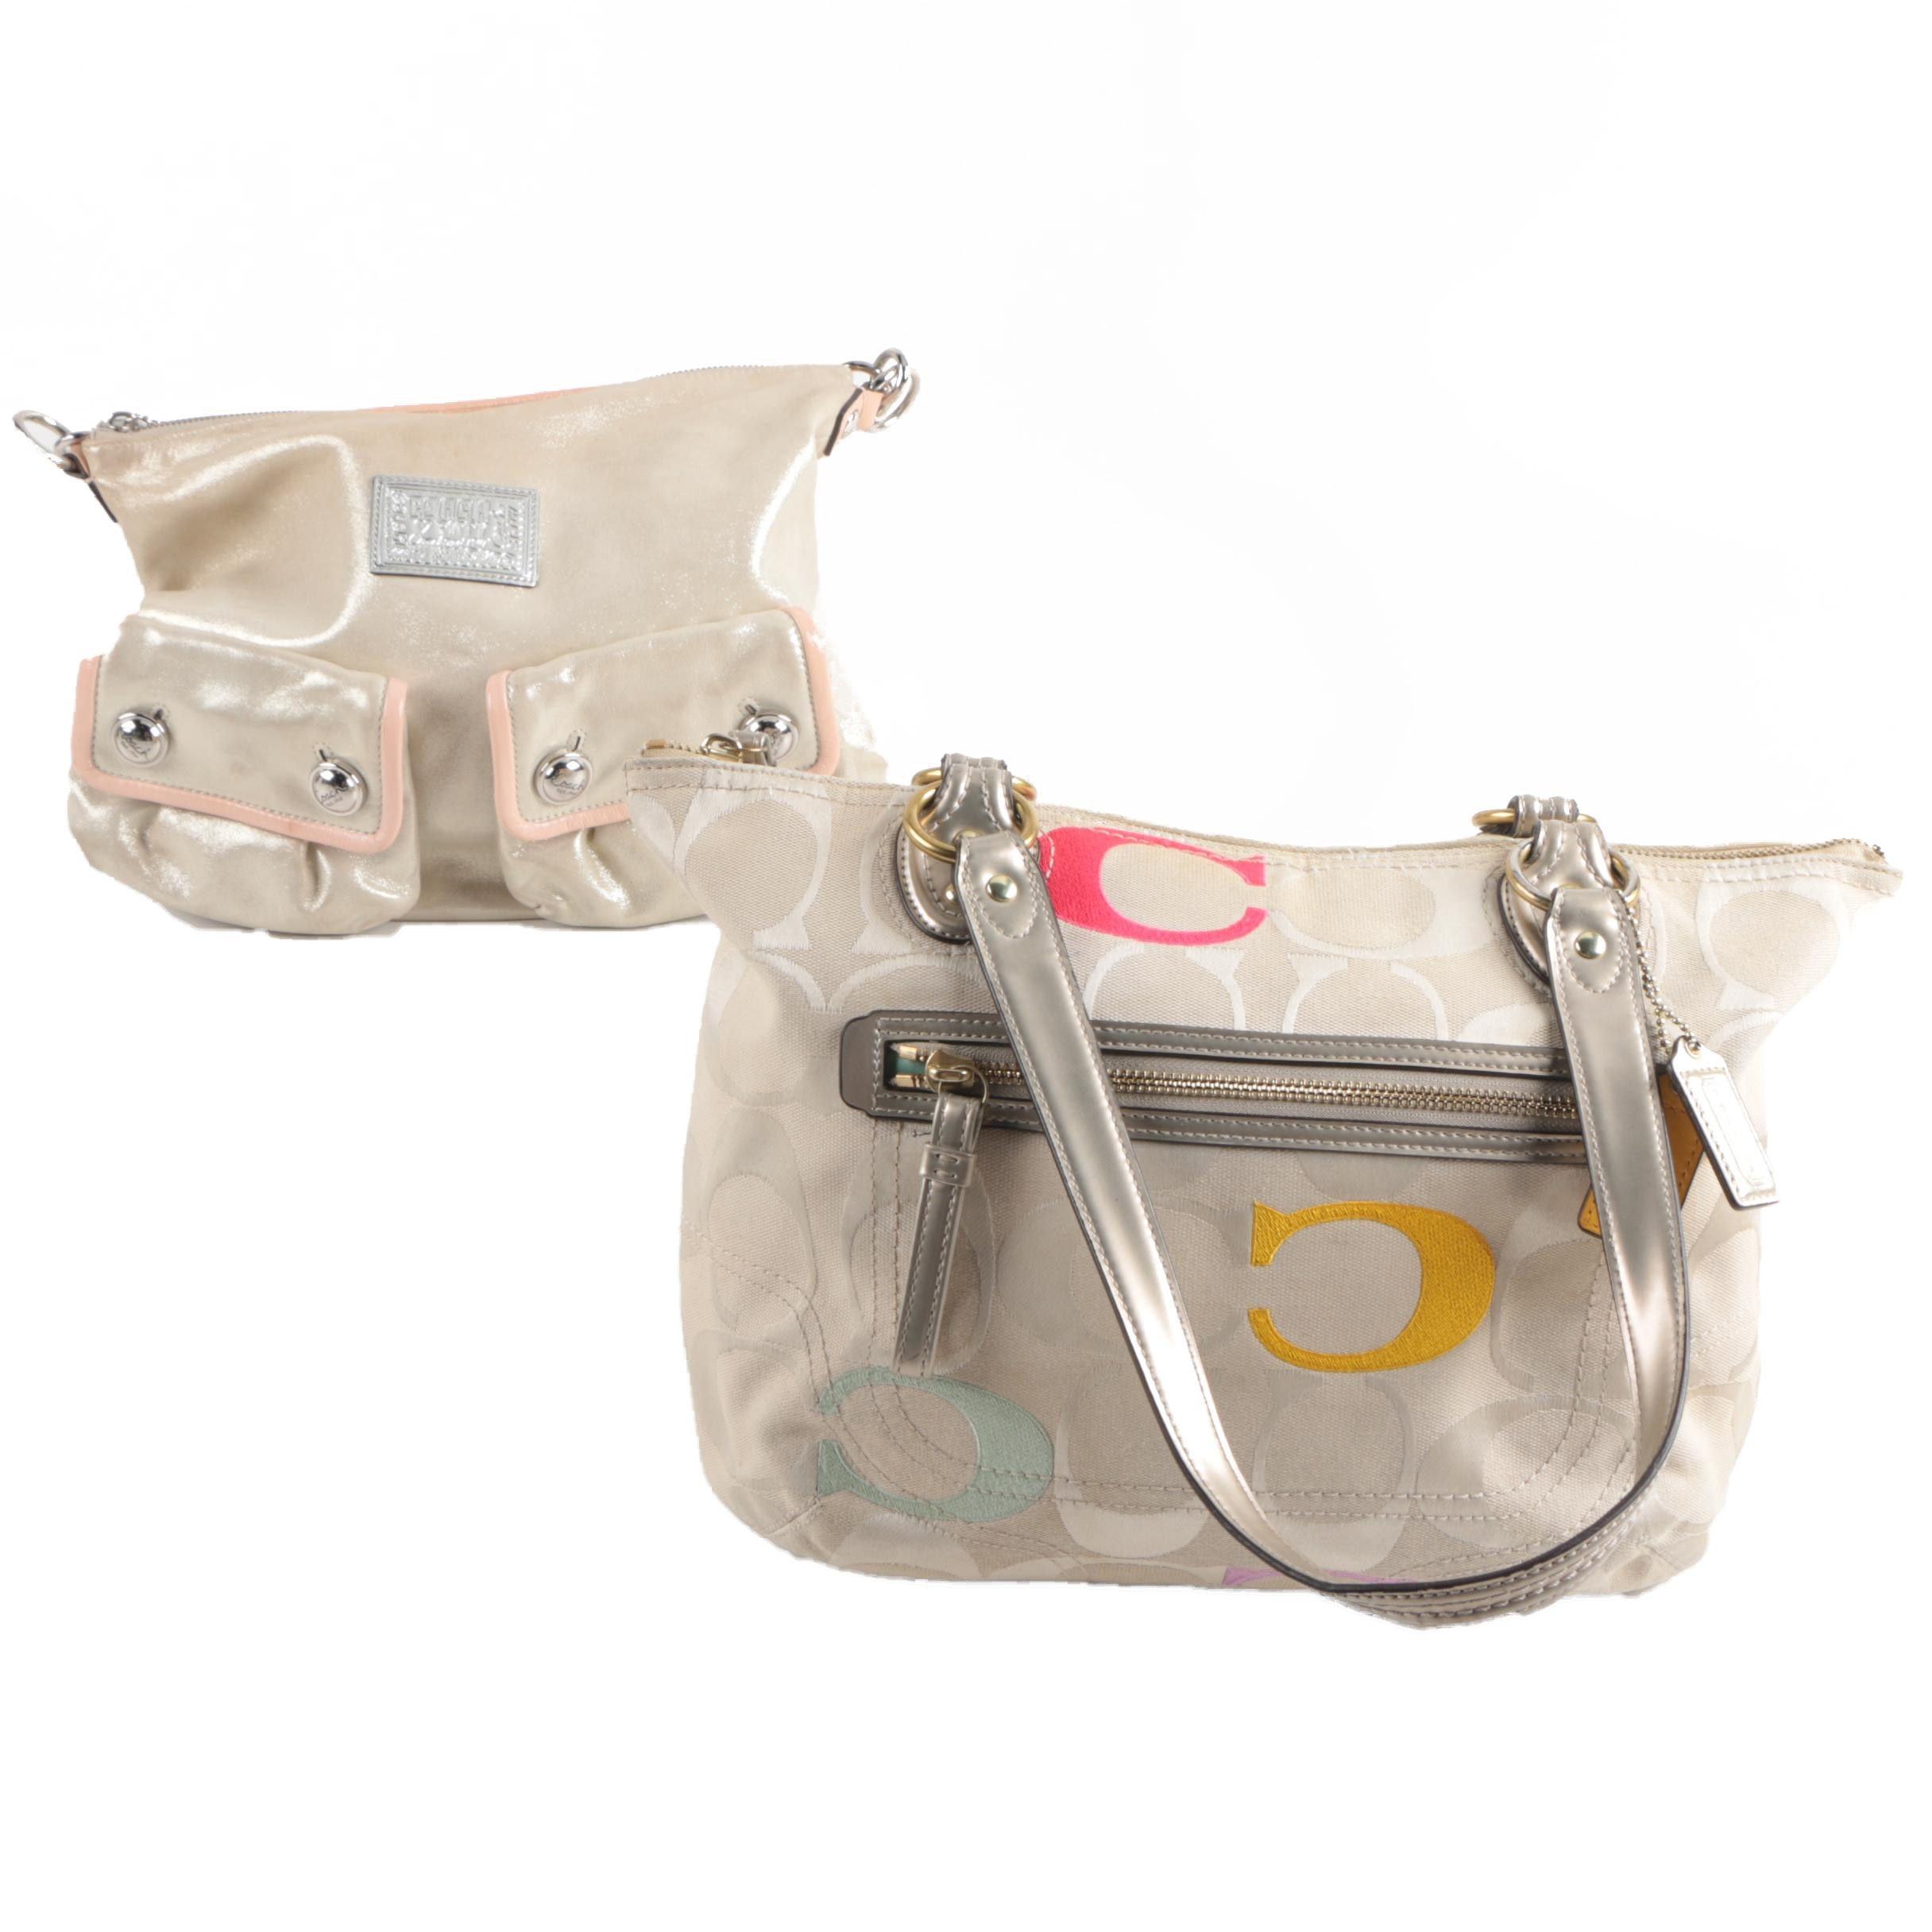 Coach Signature Poppy Handbags